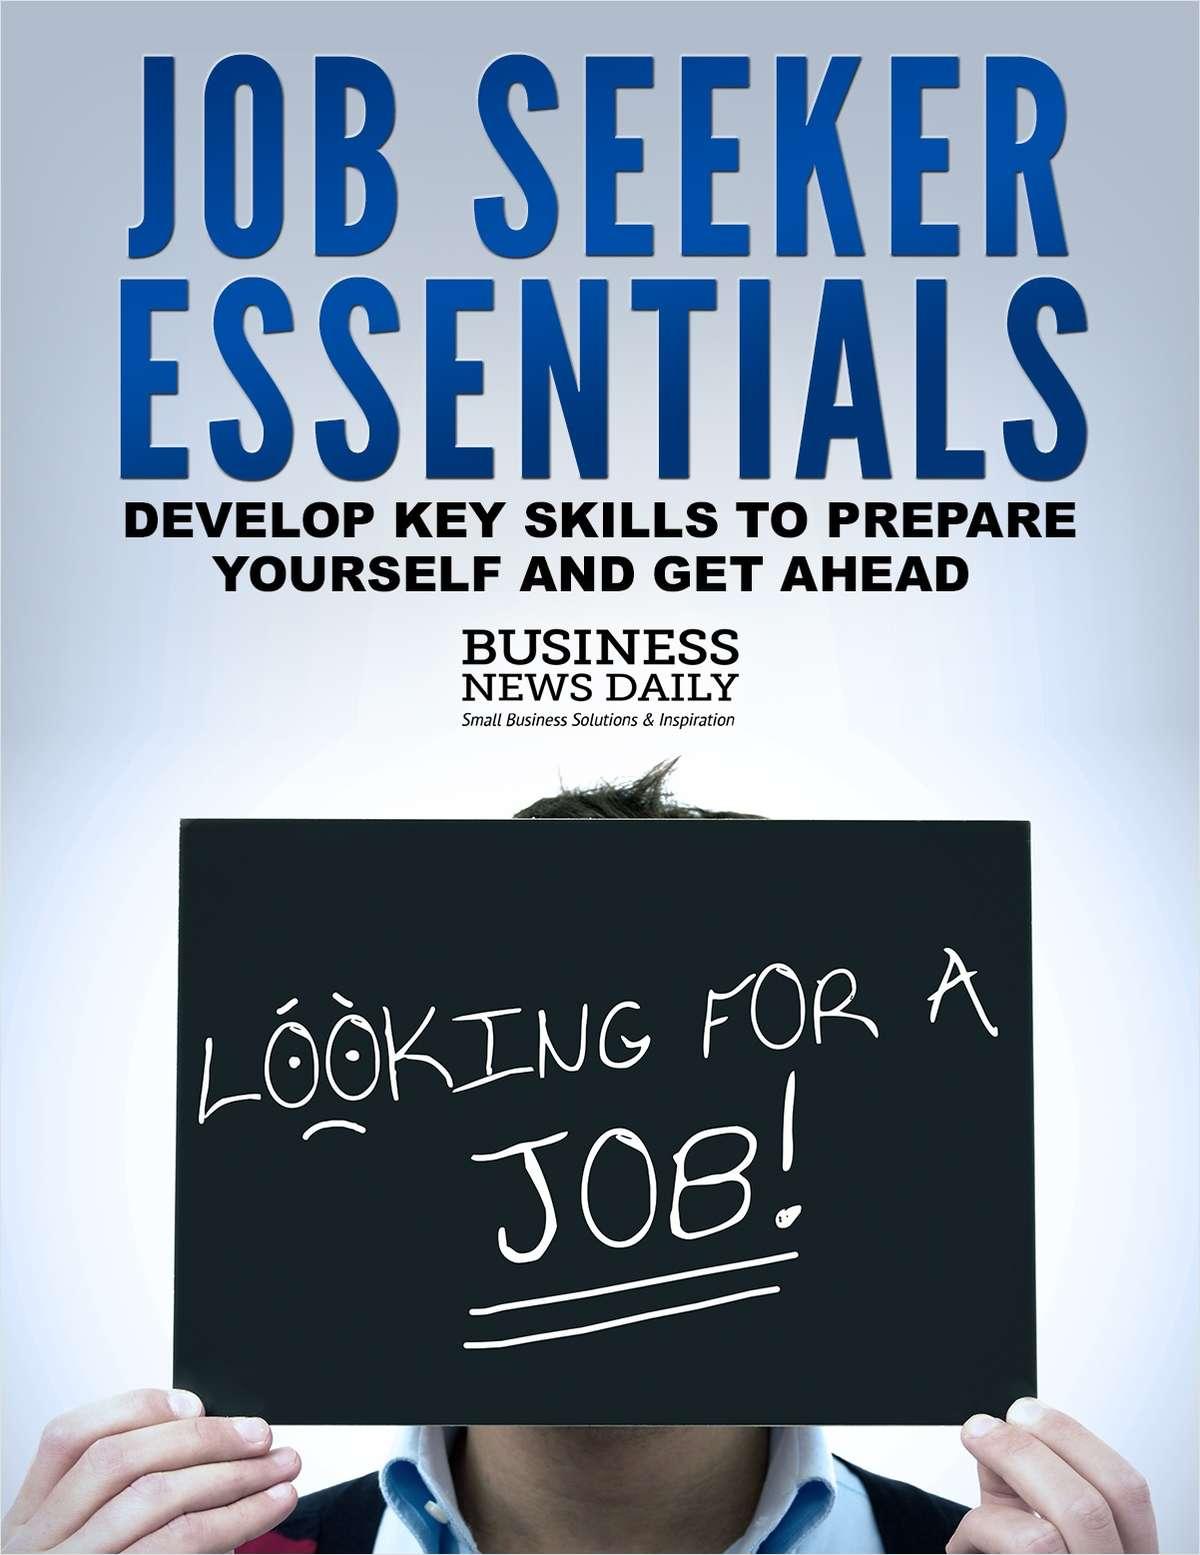 Job Seeker Essentials - Develop Key Skills to Prepare Yourself and Get Ahead